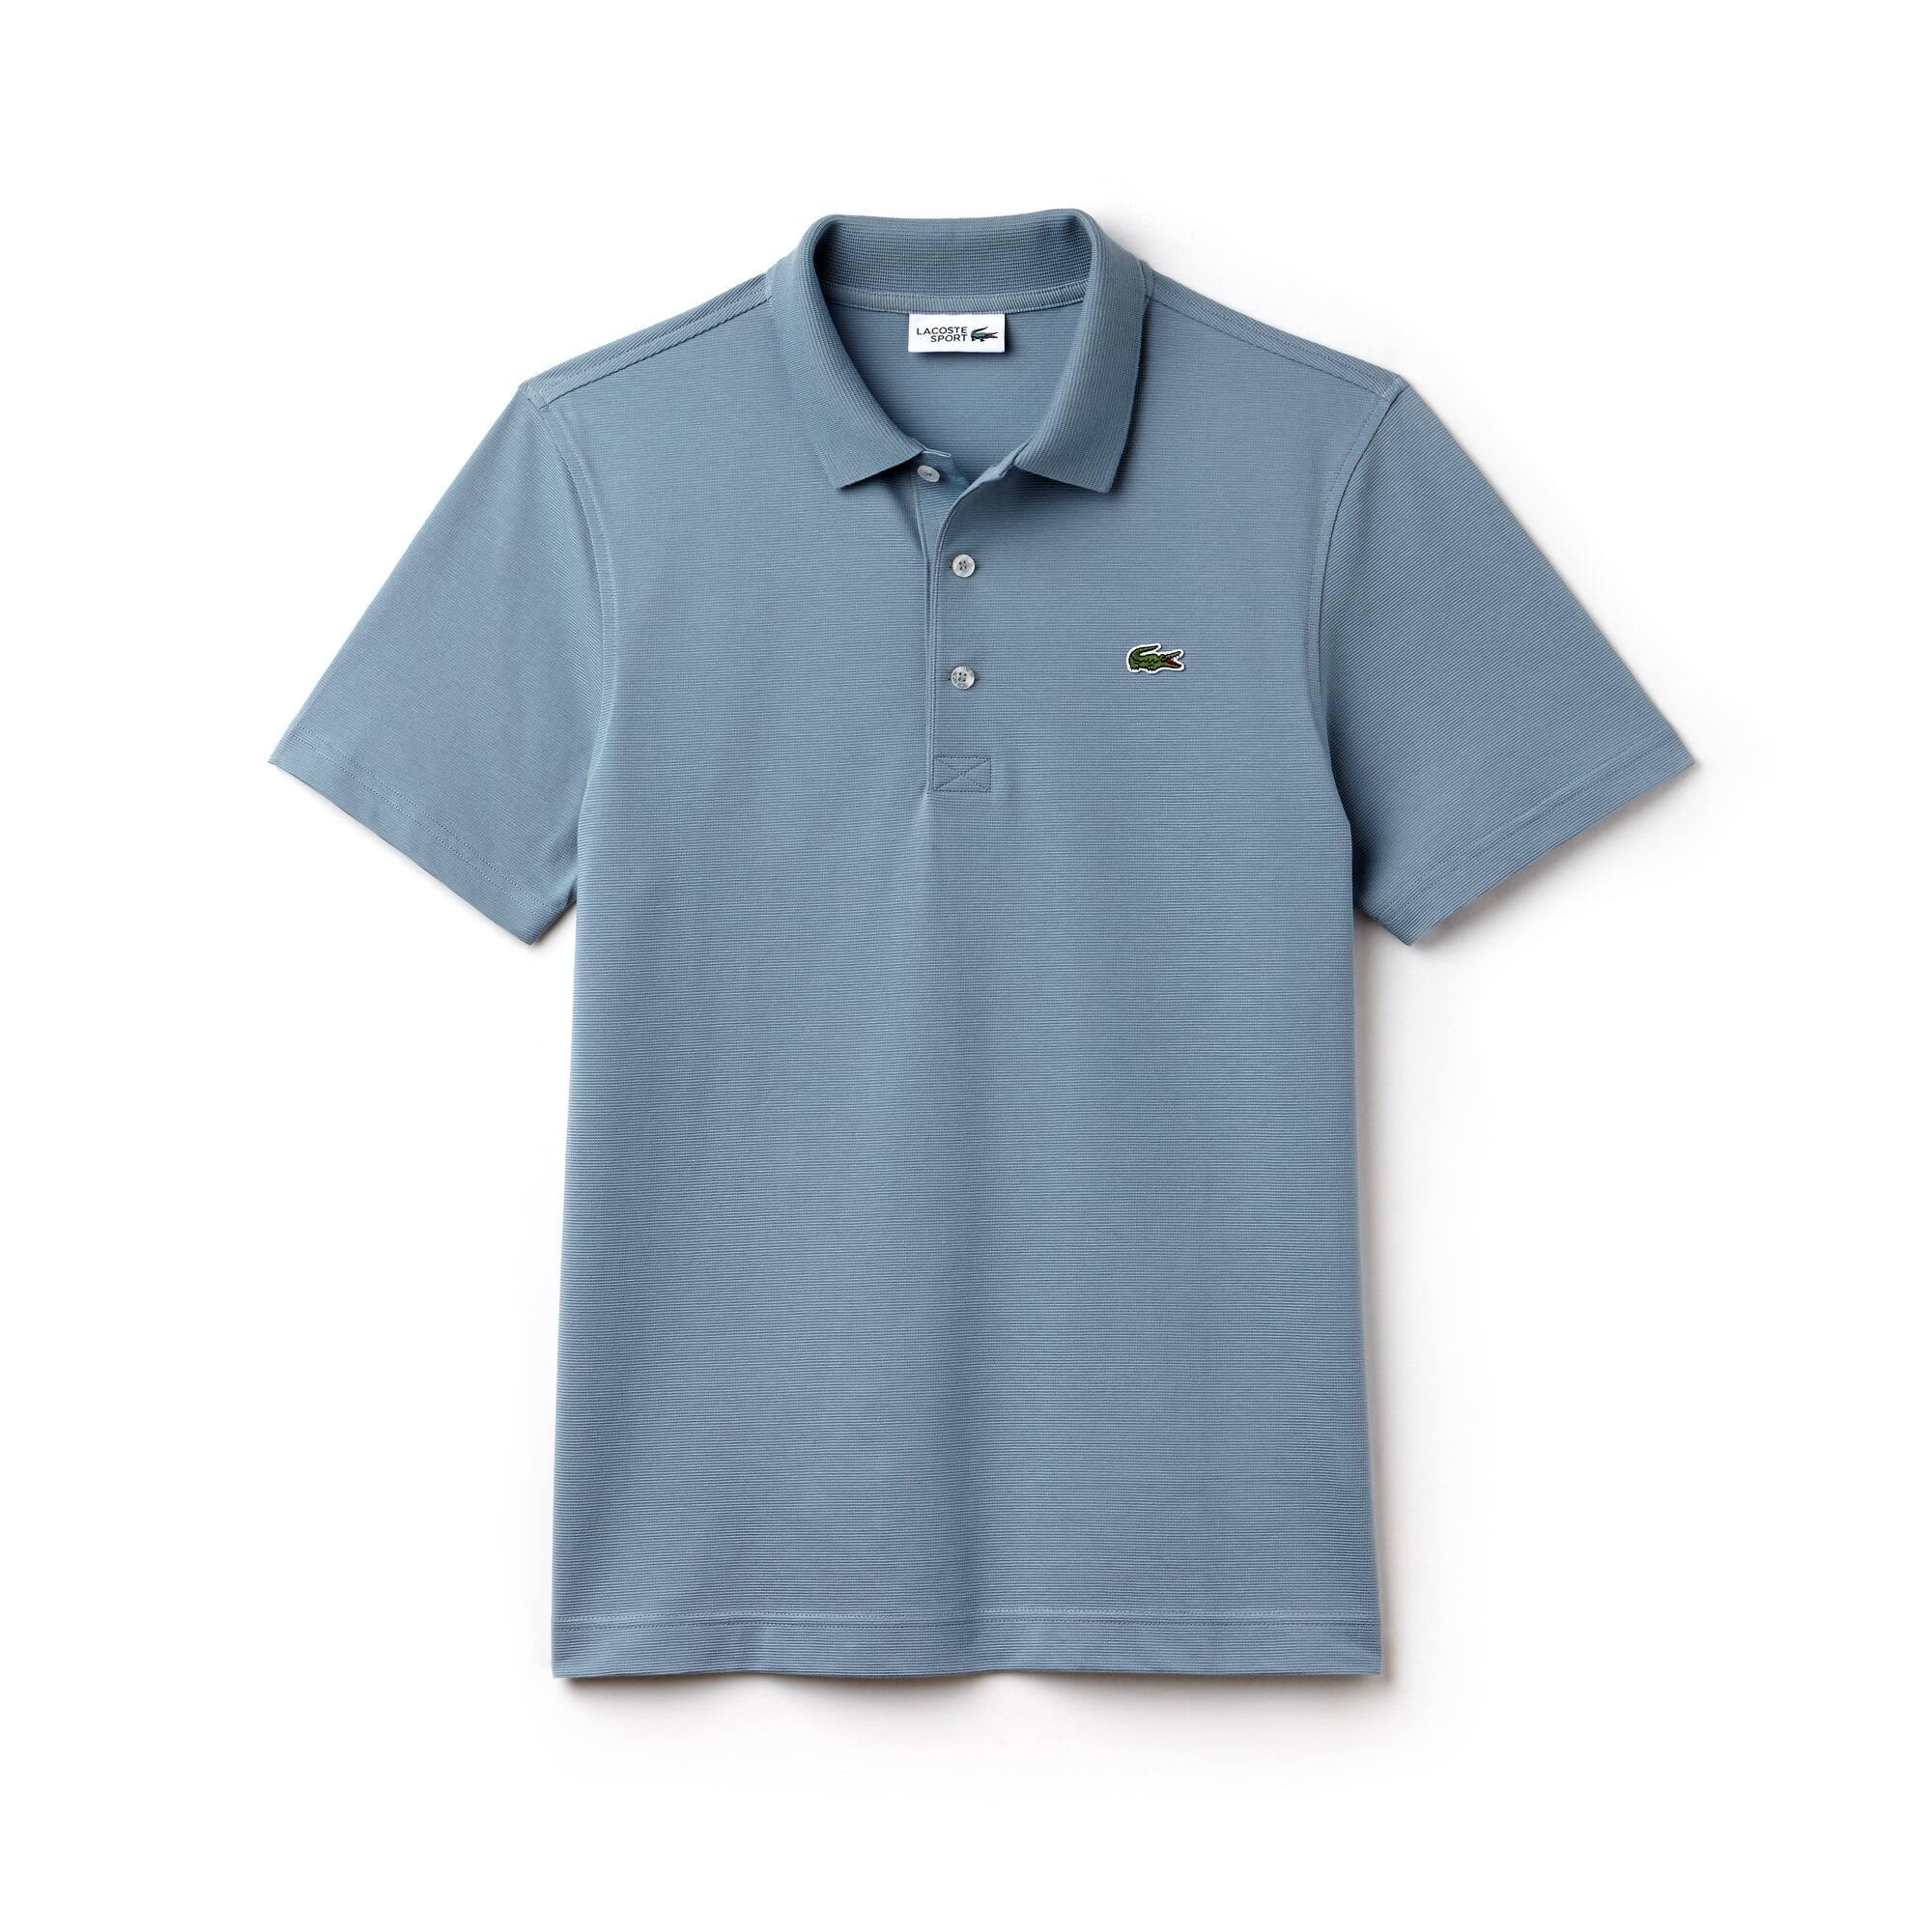 Polo Tennis Lacoste SPORT YH4770 neuf